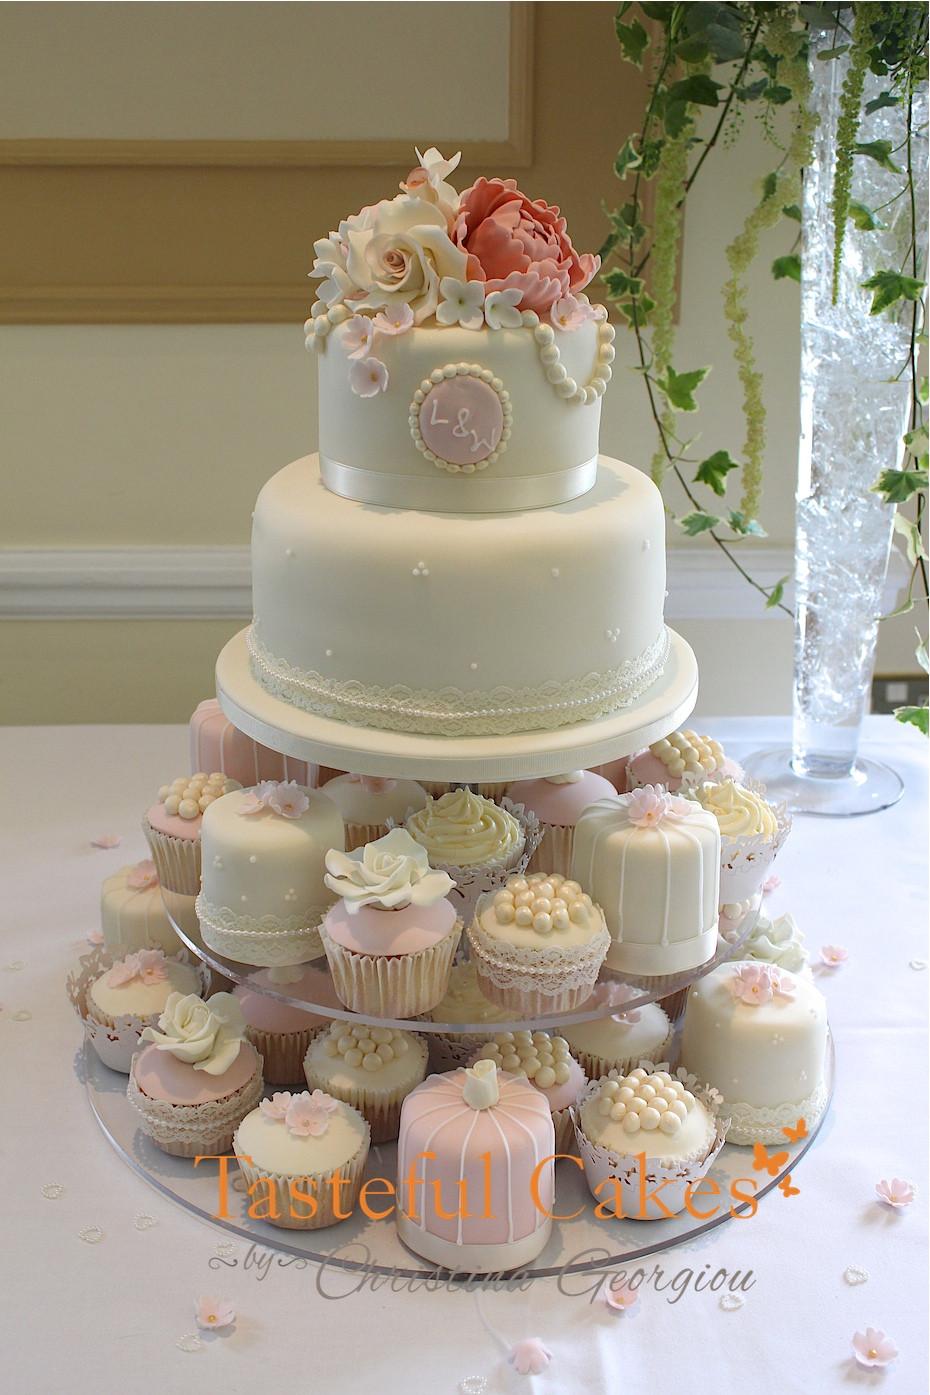 Cupcakes Wedding Cakes  Tasteful Cakes By Christina Georgiou